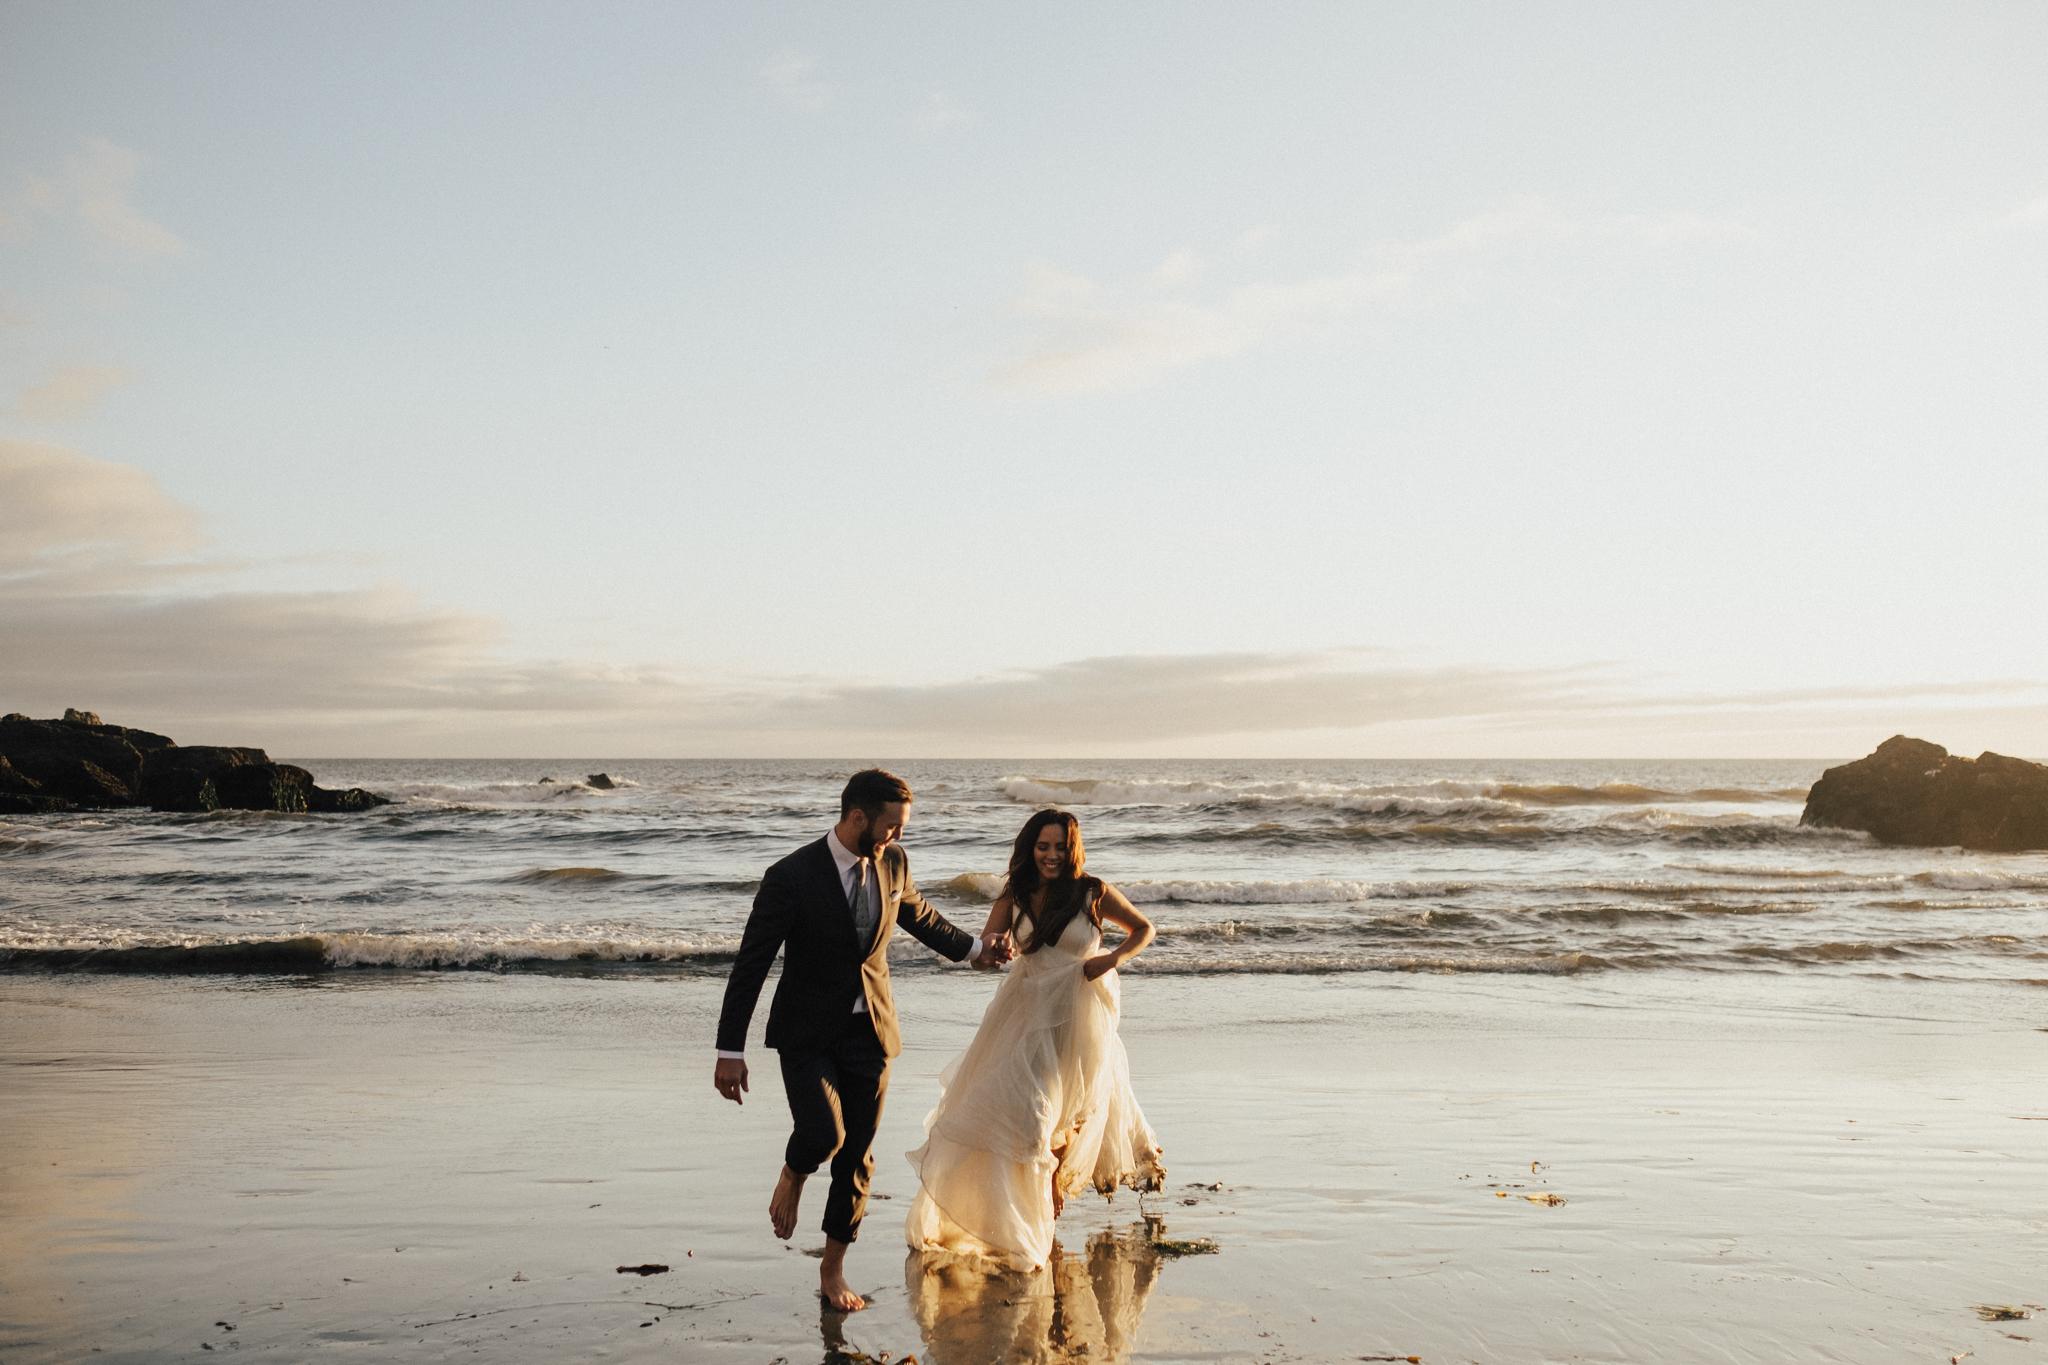 Arizona-Adventure-Elopement-Wedding-Photographer-86.jpg